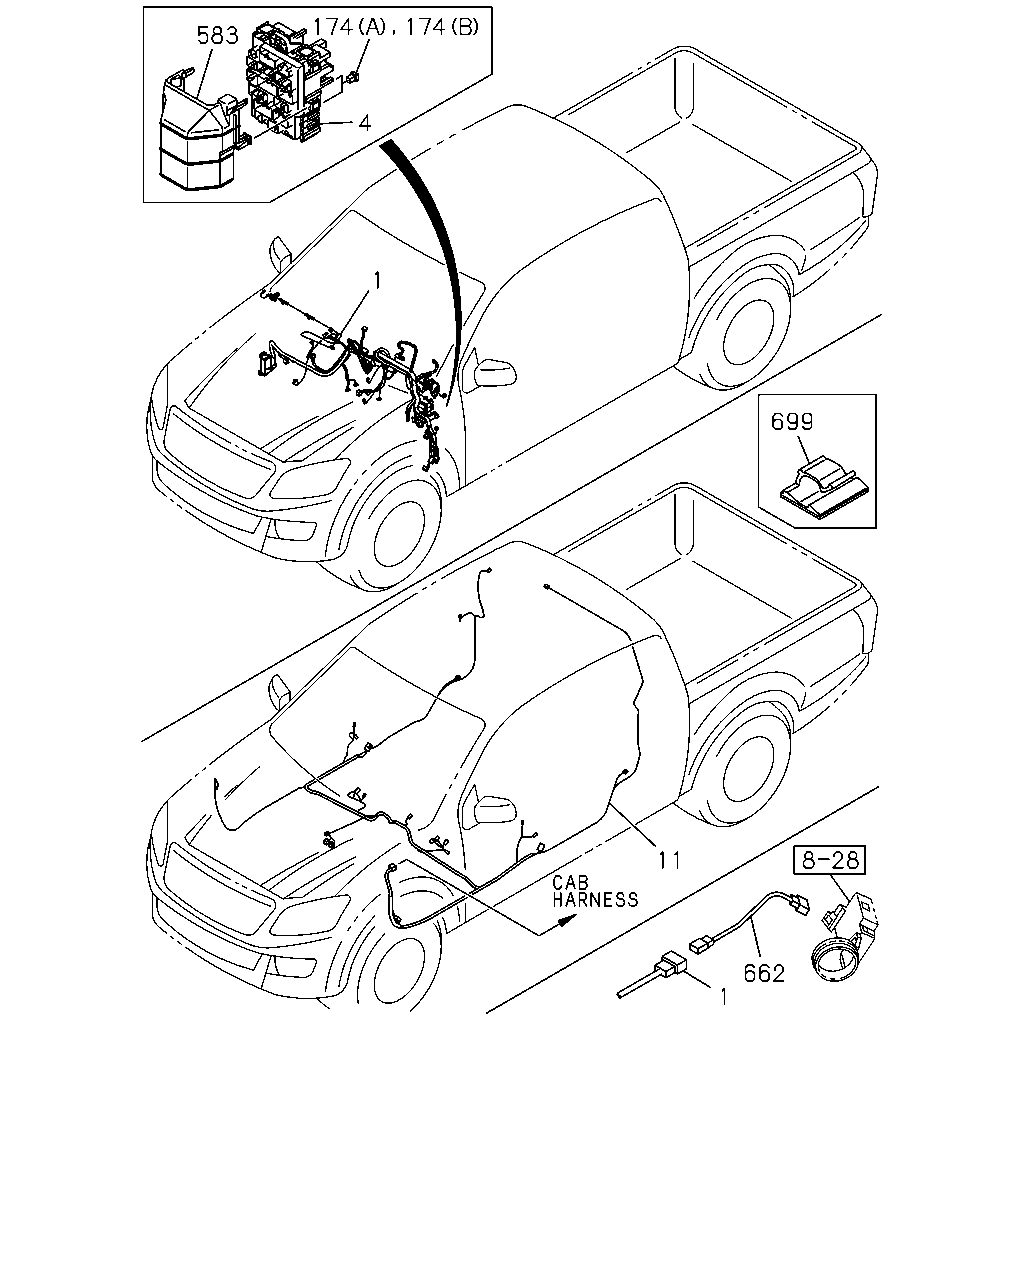 A tfb6sf 4x2 regular cab long